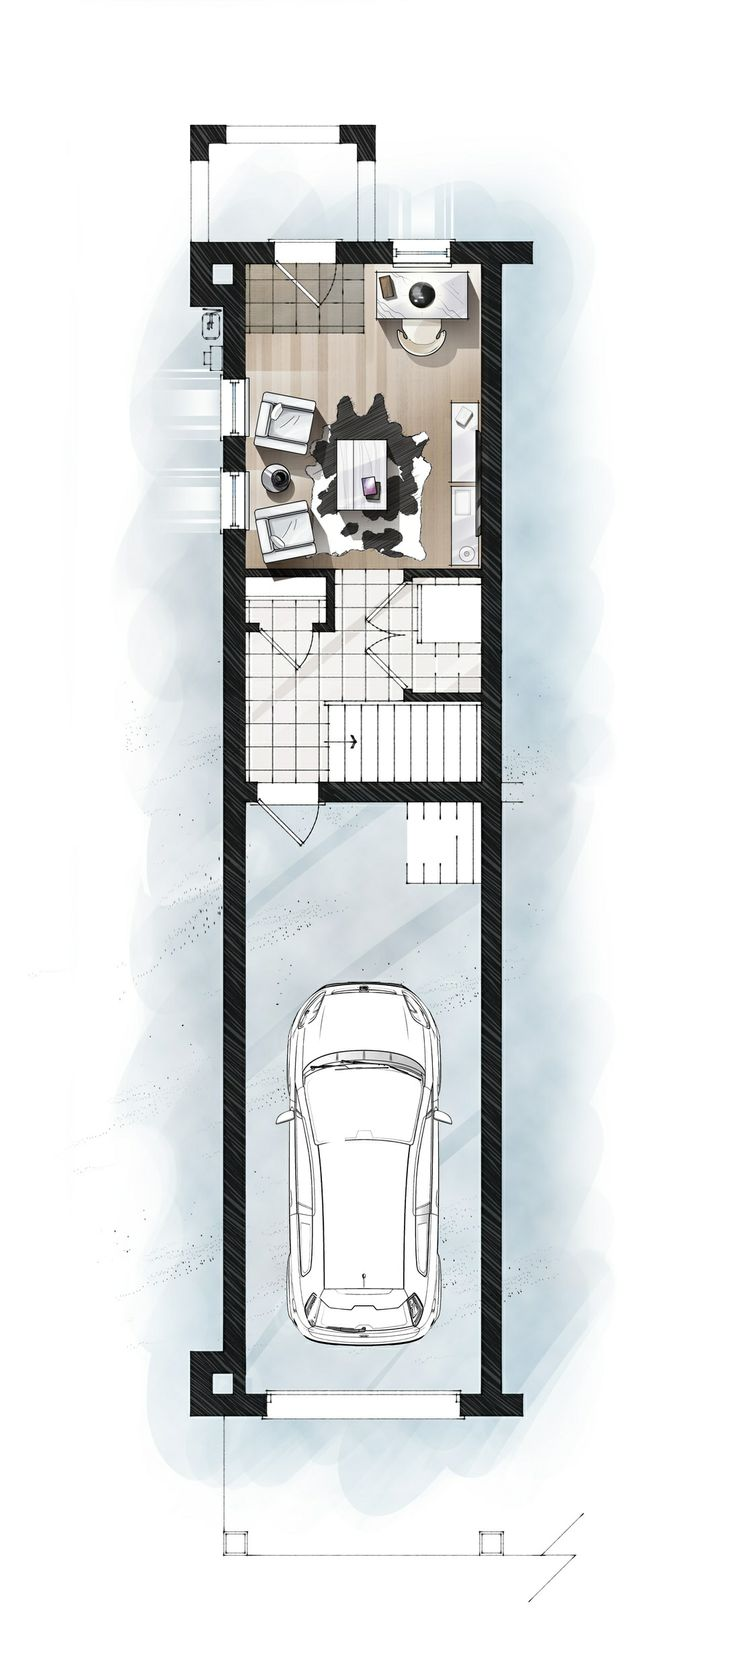 S1 Ground digital furniture/floor plan.  #Uptownes  Design: Jo-Ann Capelaci  Builder: Geranium Homes